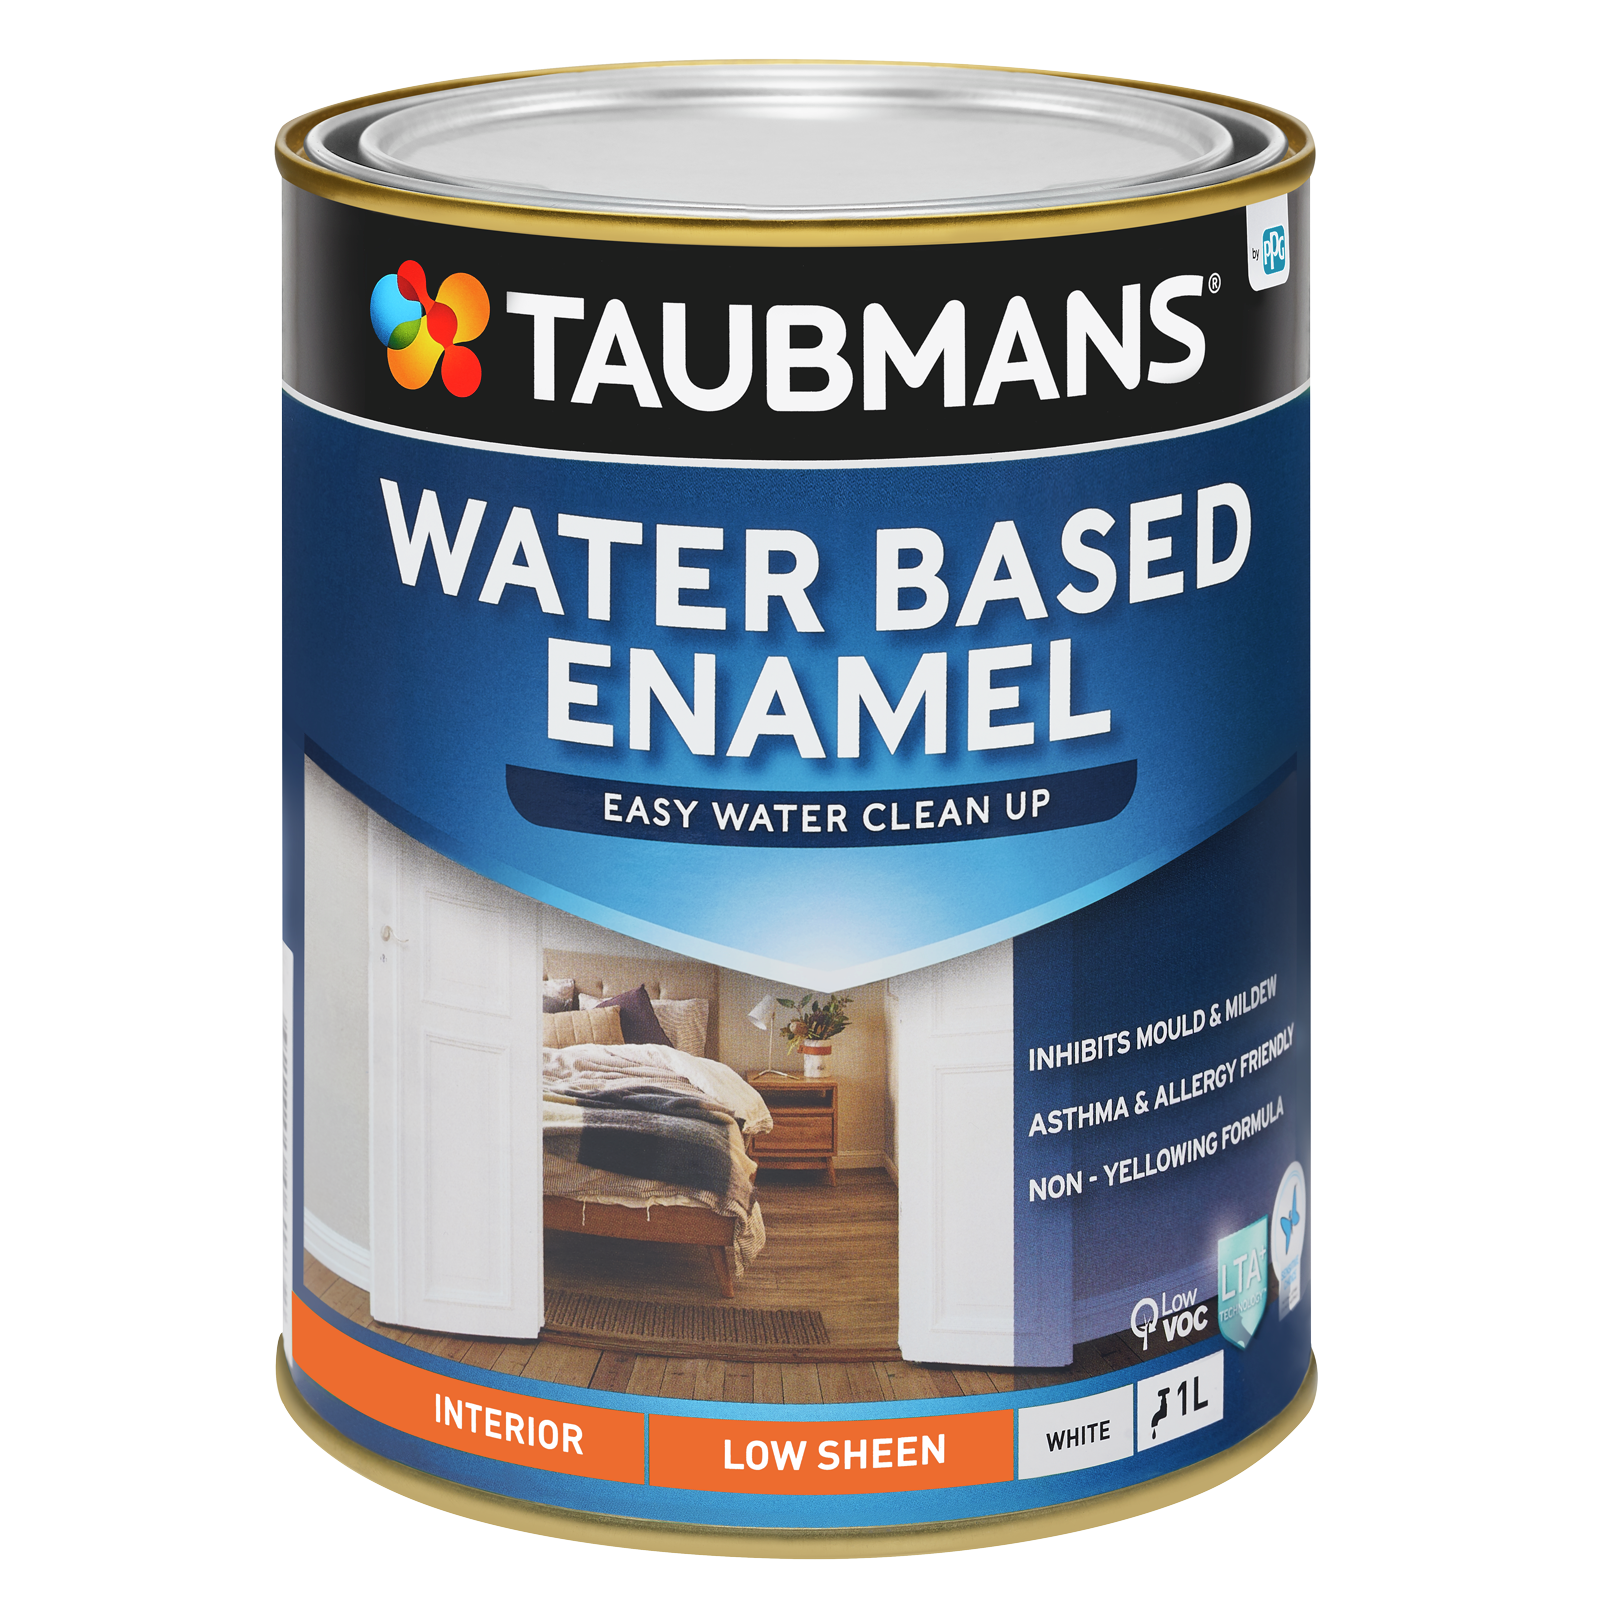 Taubmans 1L White Low Sheen Water Based Enamel